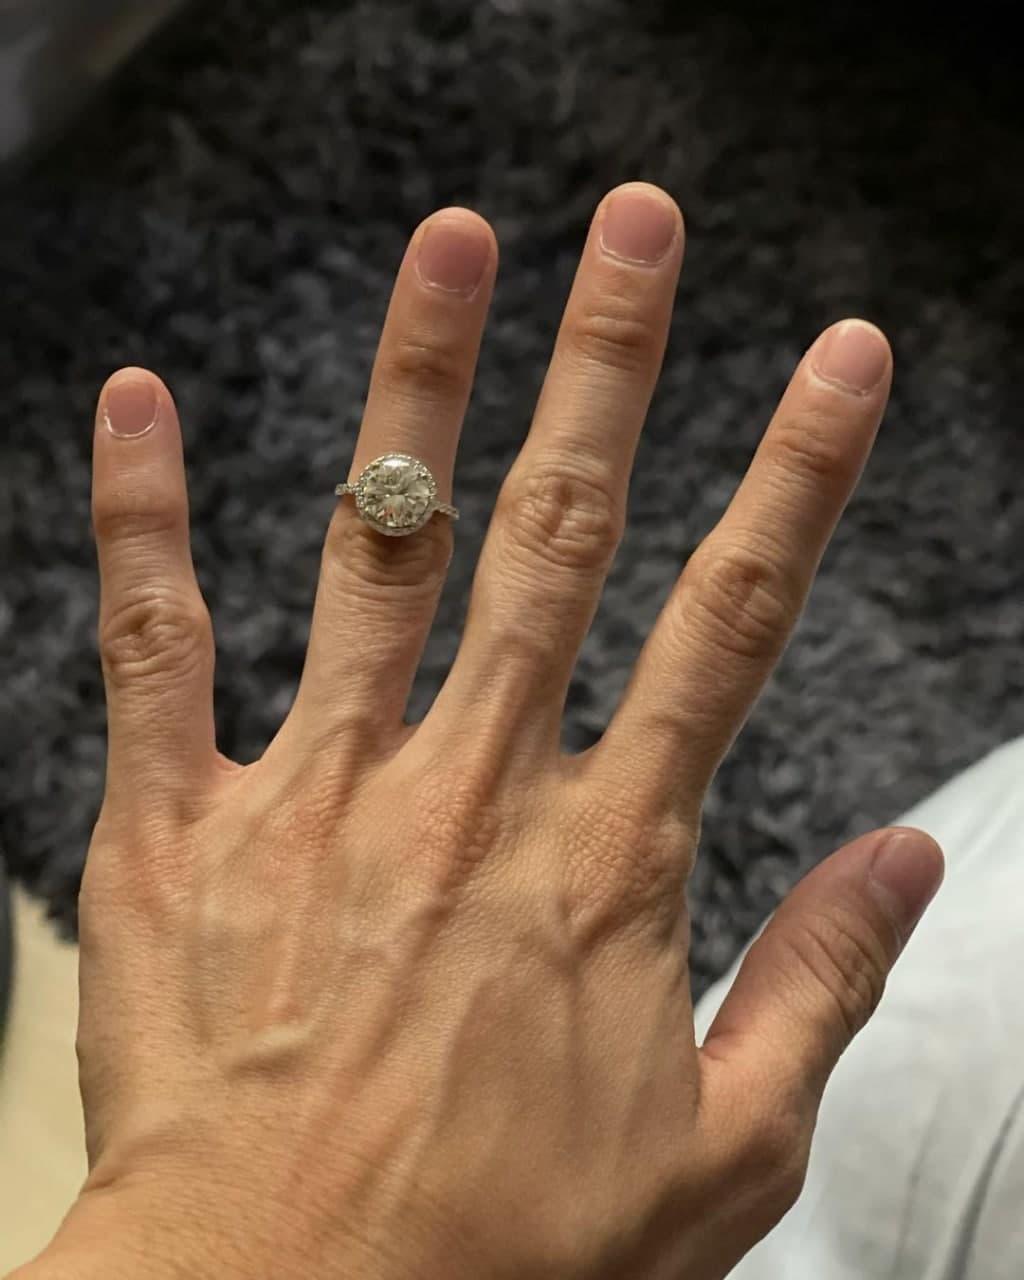 Iya Villania's wedding ring won't fit anymore